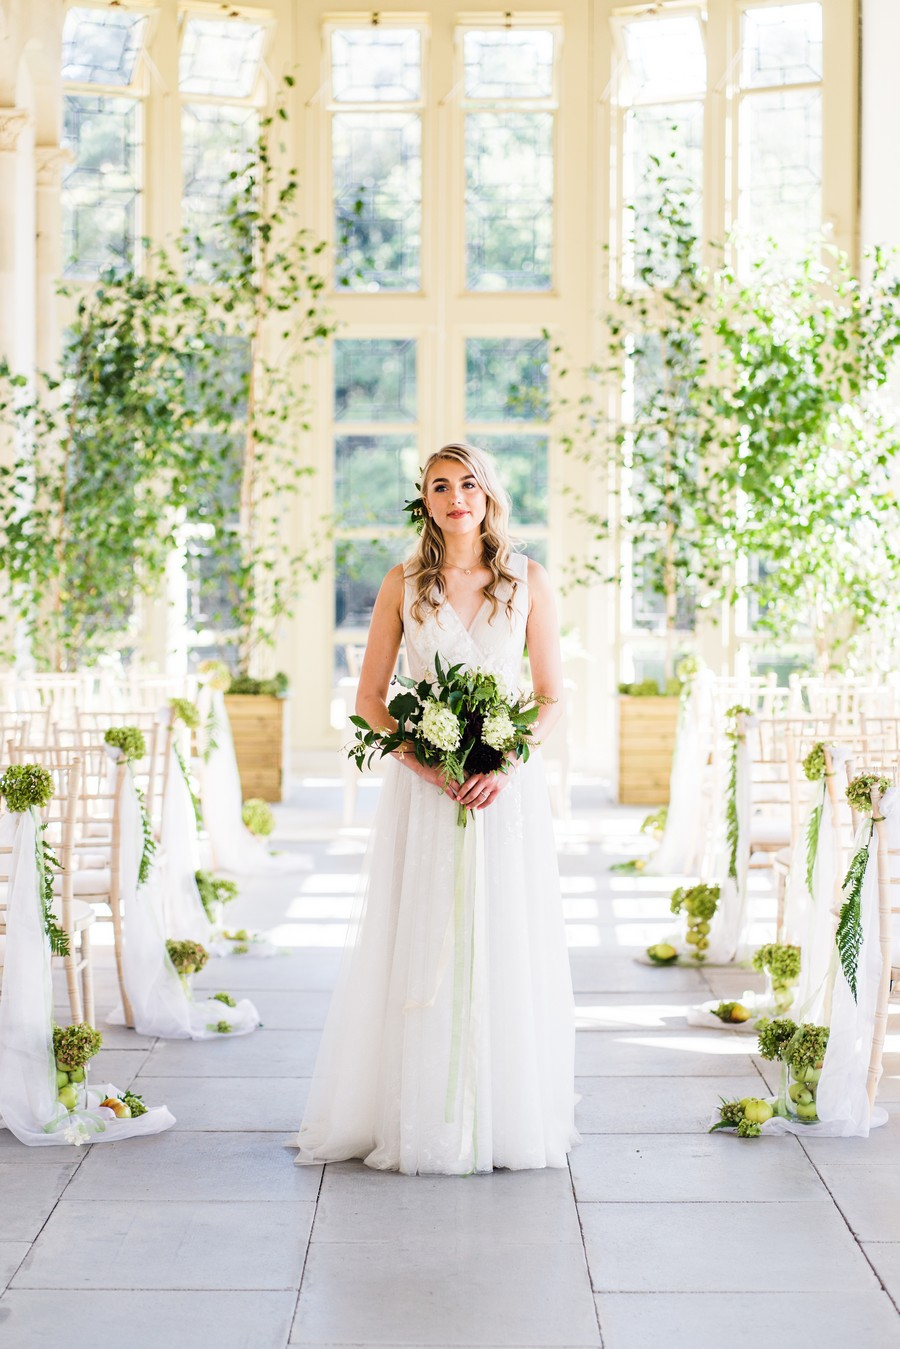 Highcliffe Castle wedding inspiration on the English Wedding Blog (12)